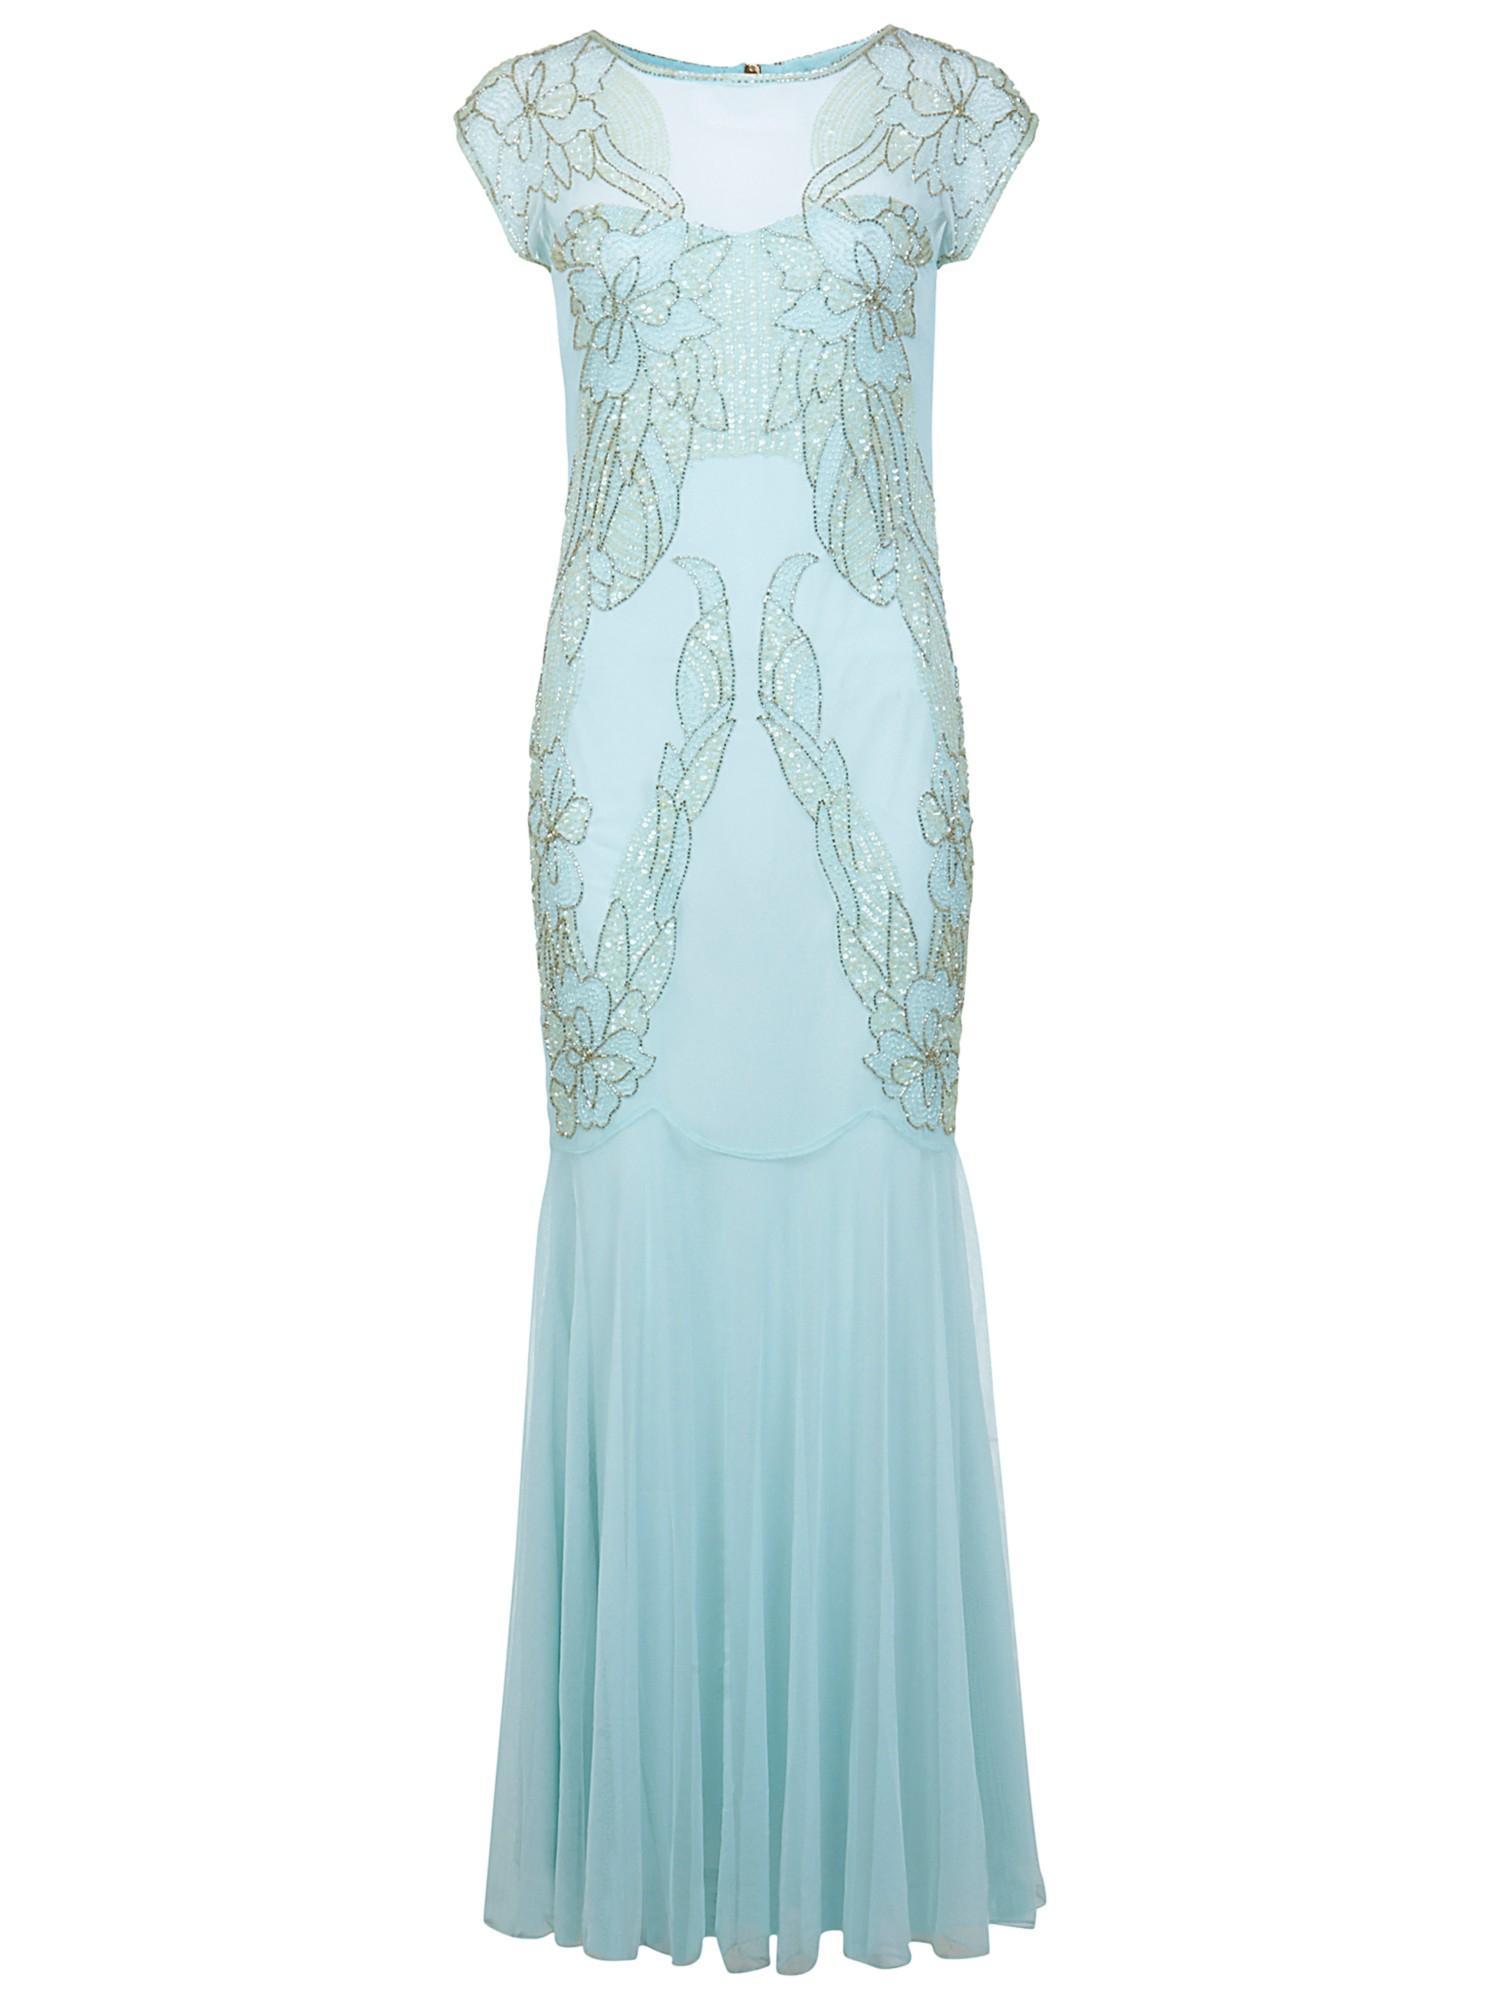 Dresses Miss Selfridge UK